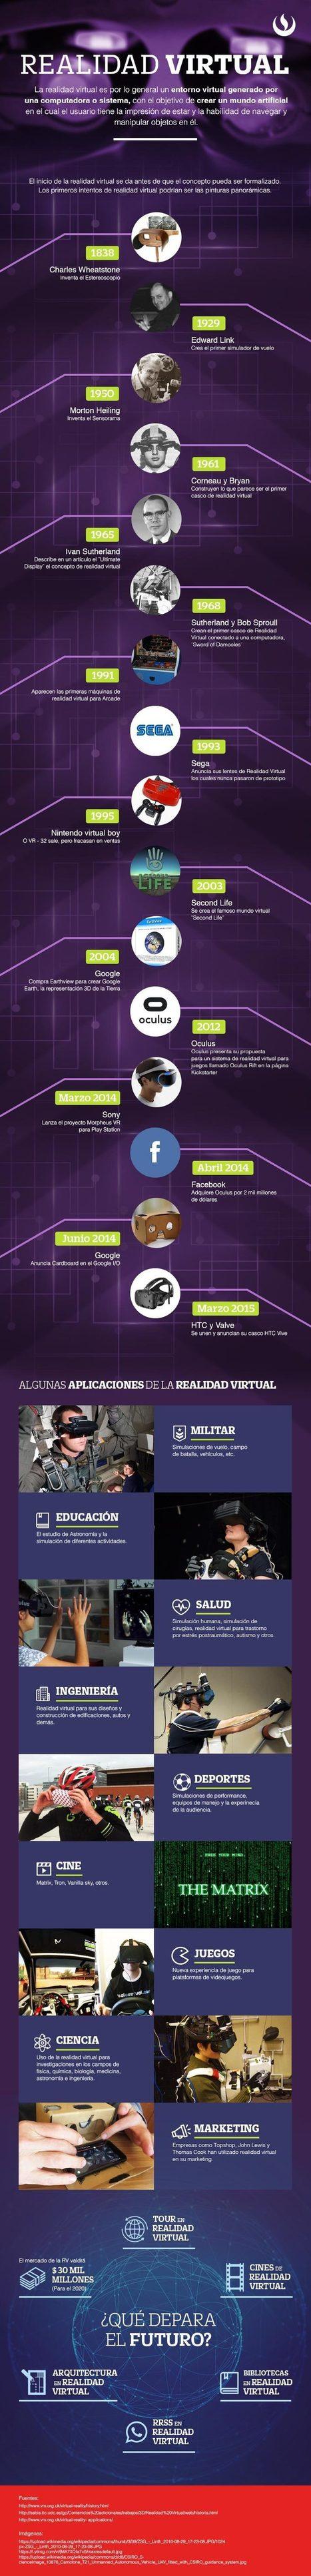 La Realidad virtual en infografia | Information Technology & Social Media News | Scoop.it